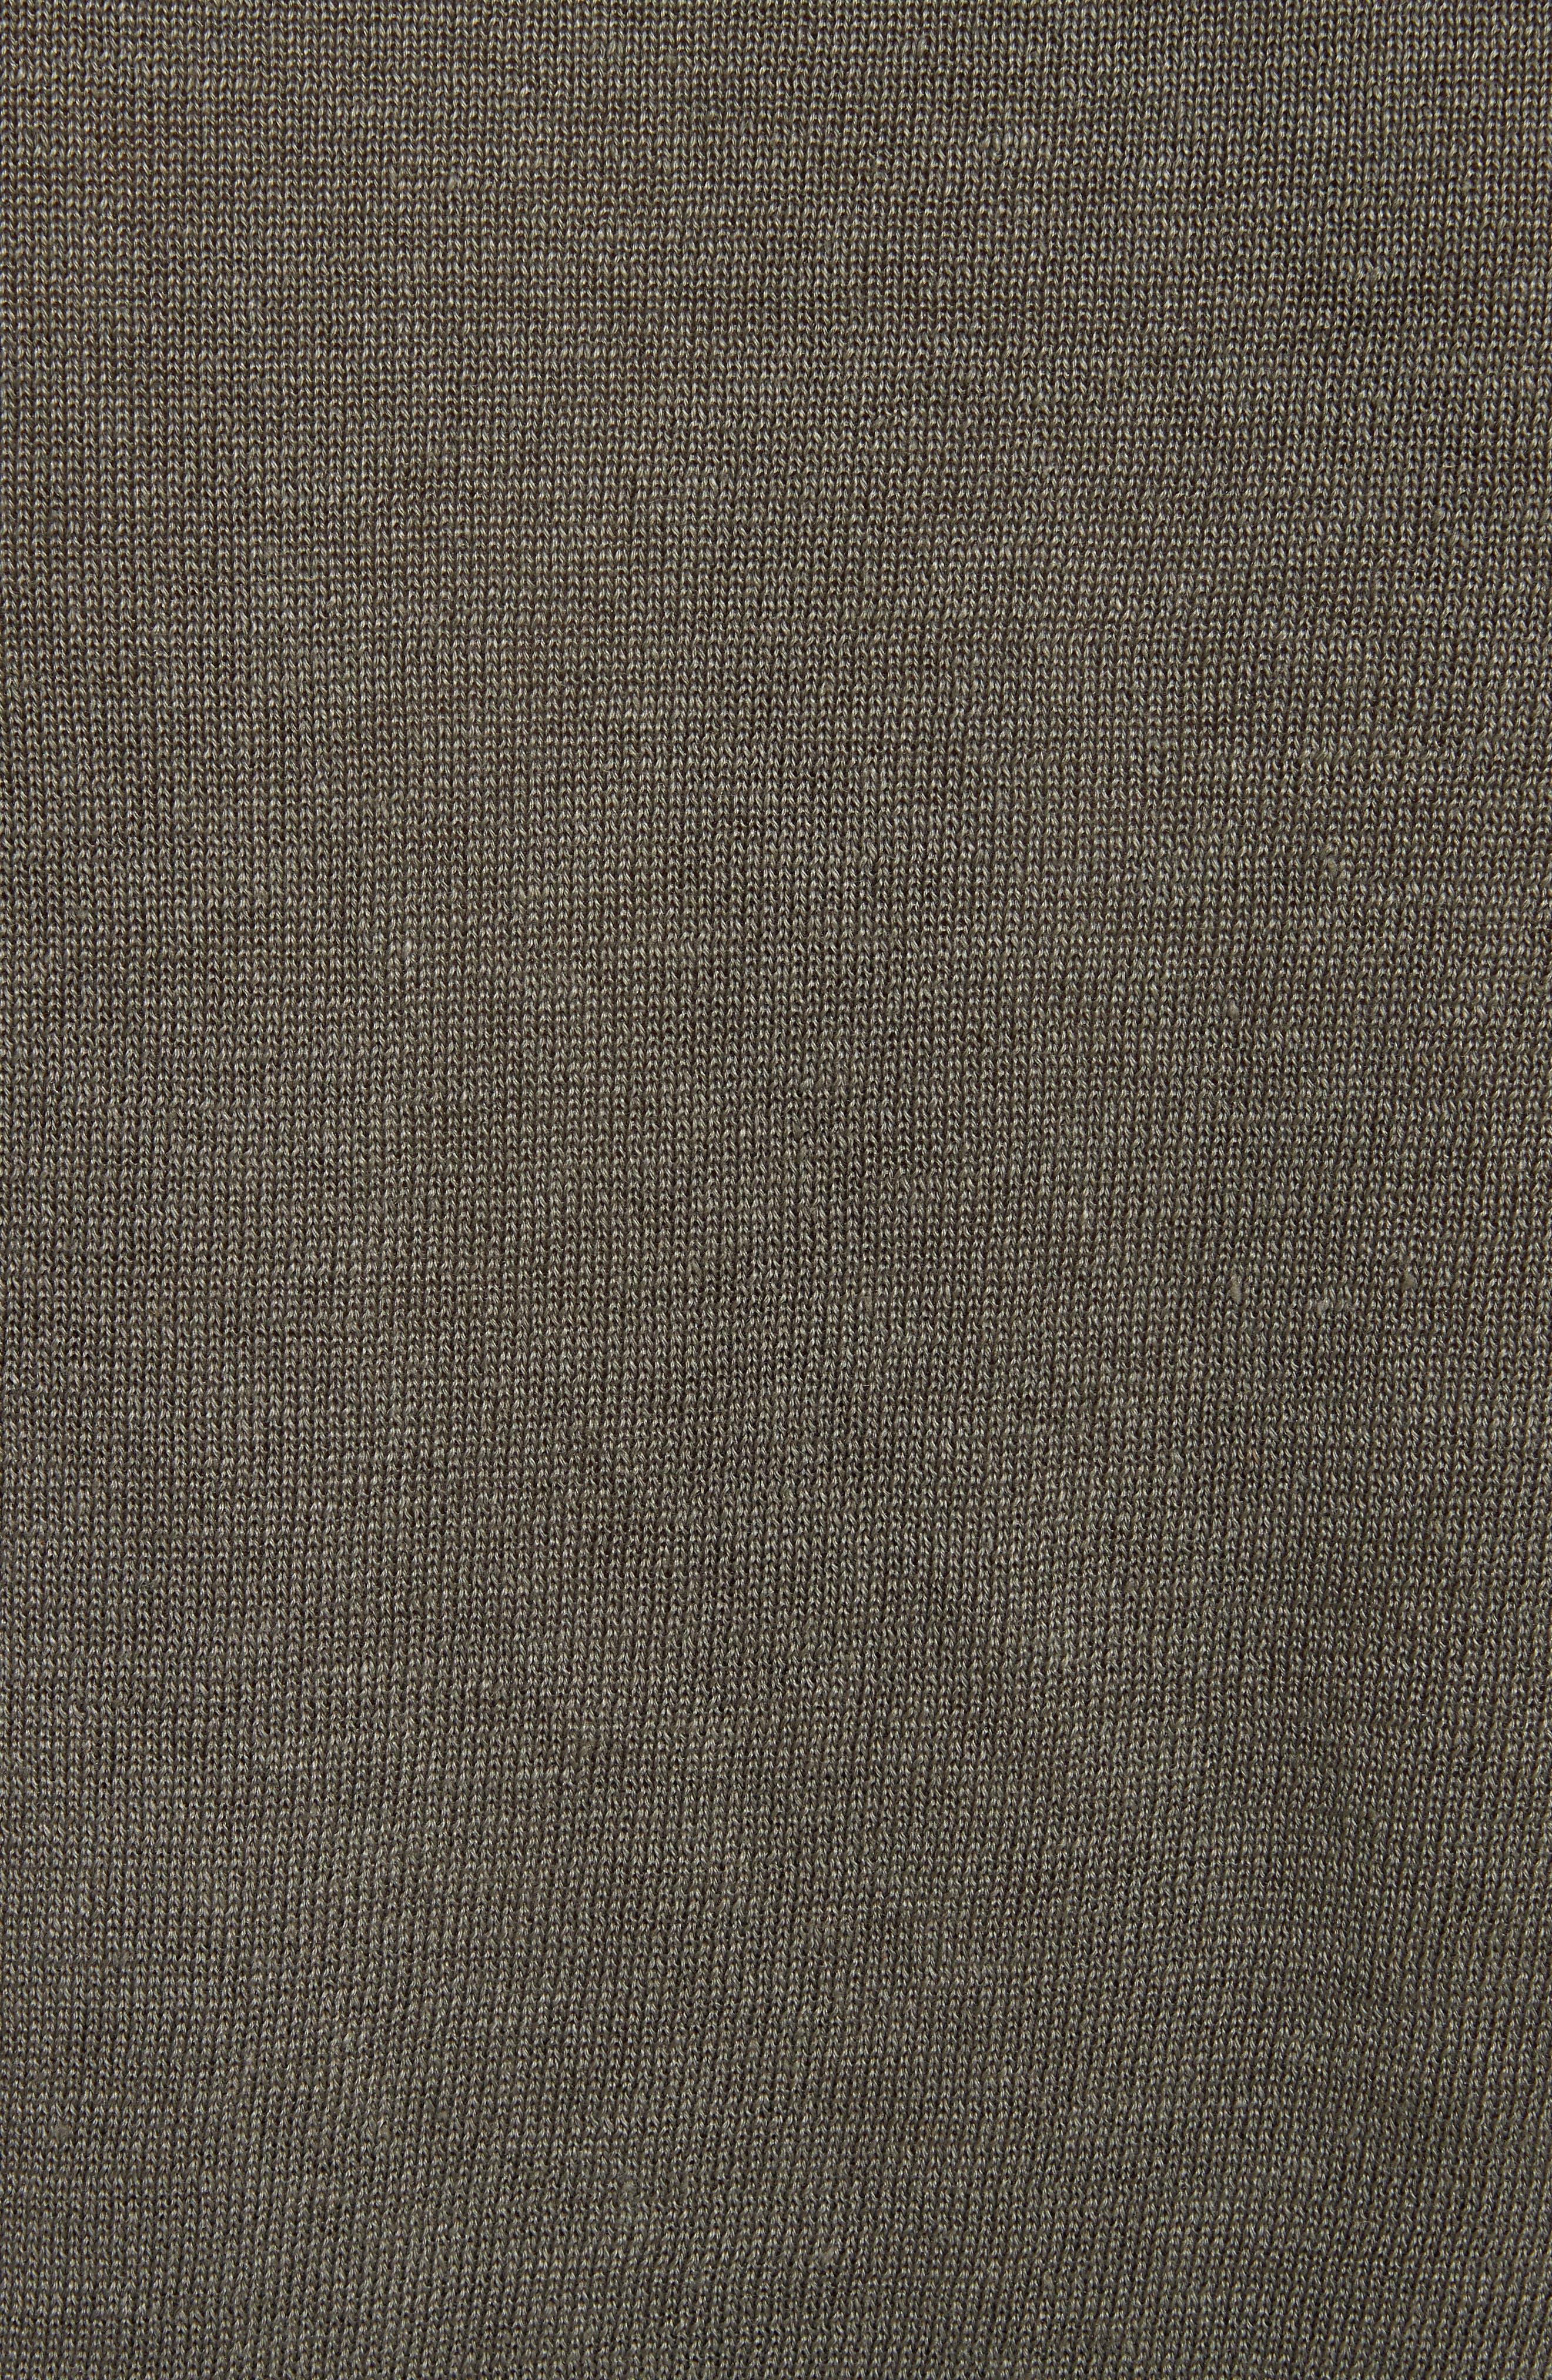 Alternate Image 5  - Belstaff Exford Linen Crewneck Sweater